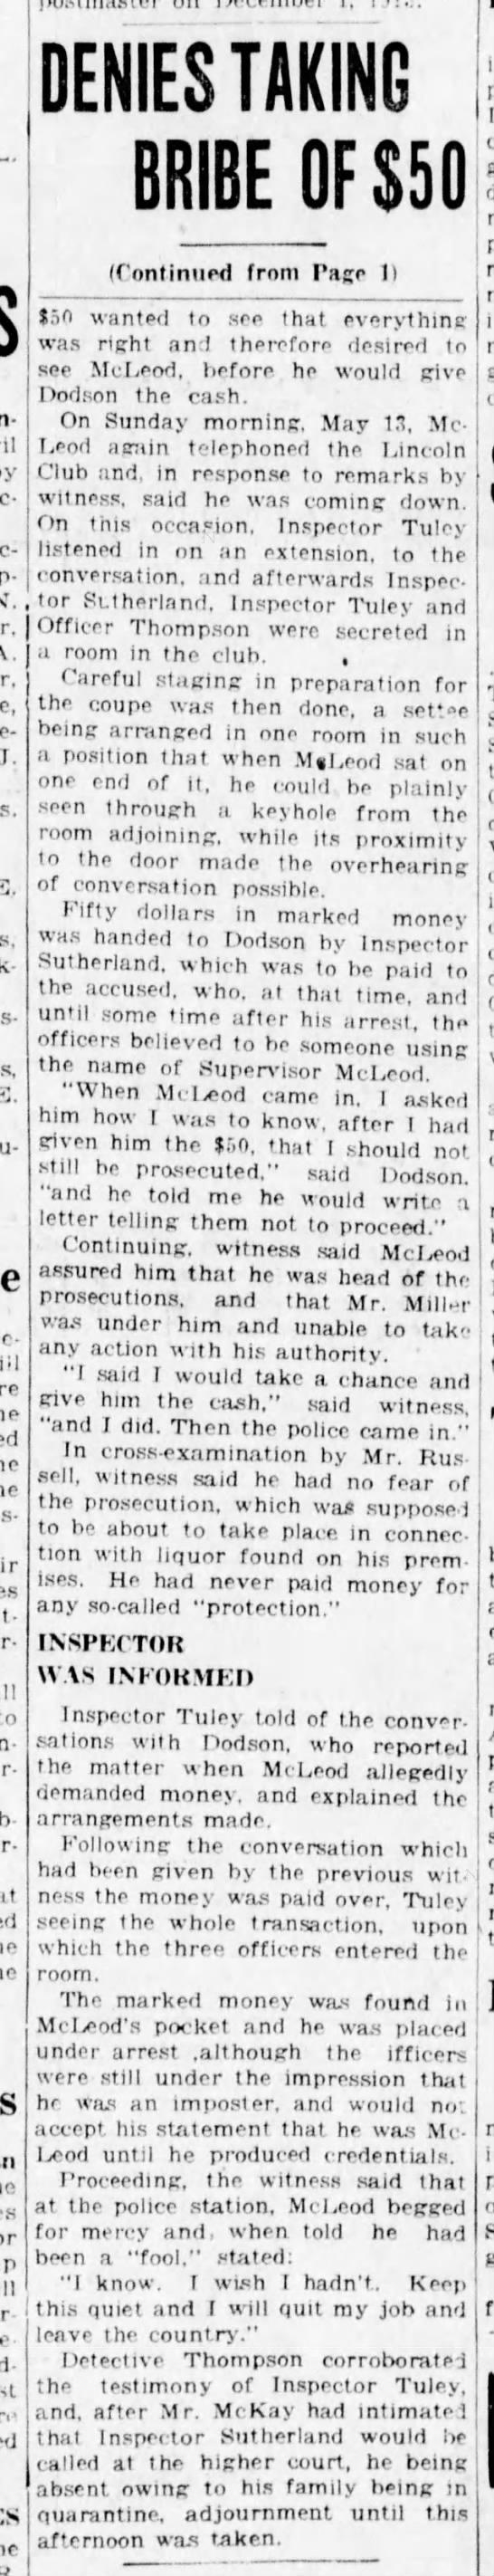 McLeod denies taking bribe from Dotson (2of2) 28May23 - - - - J. - - E. - to at D E NIES Tfl KING BRIBE...